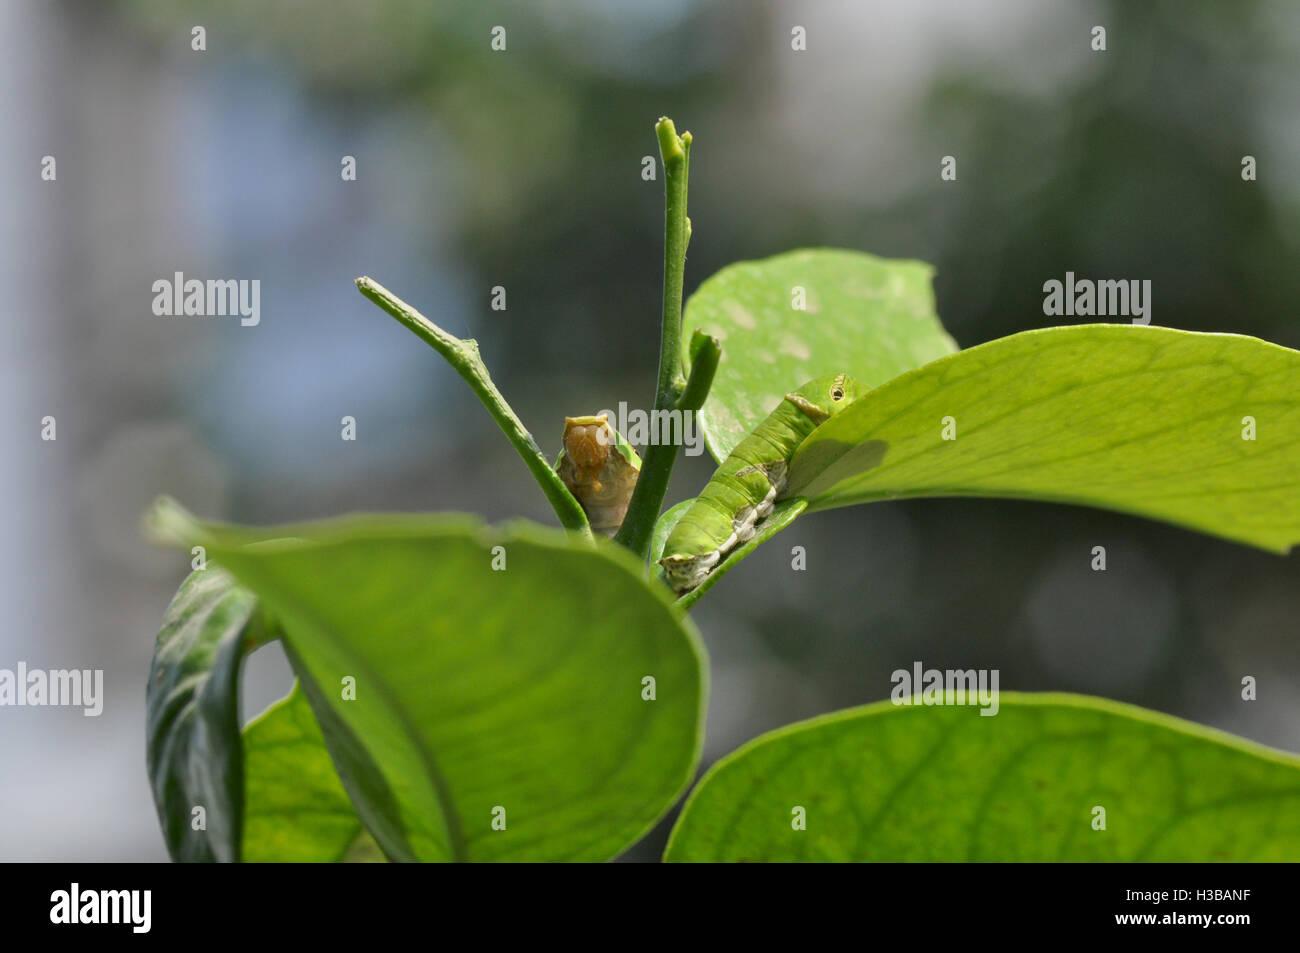 Noida, Uttar Pradesh, India-April 4, 2016: Hungry Citrus Swallowtail butterfly Caterpillars on a Lemon tree leaf - Stock Image